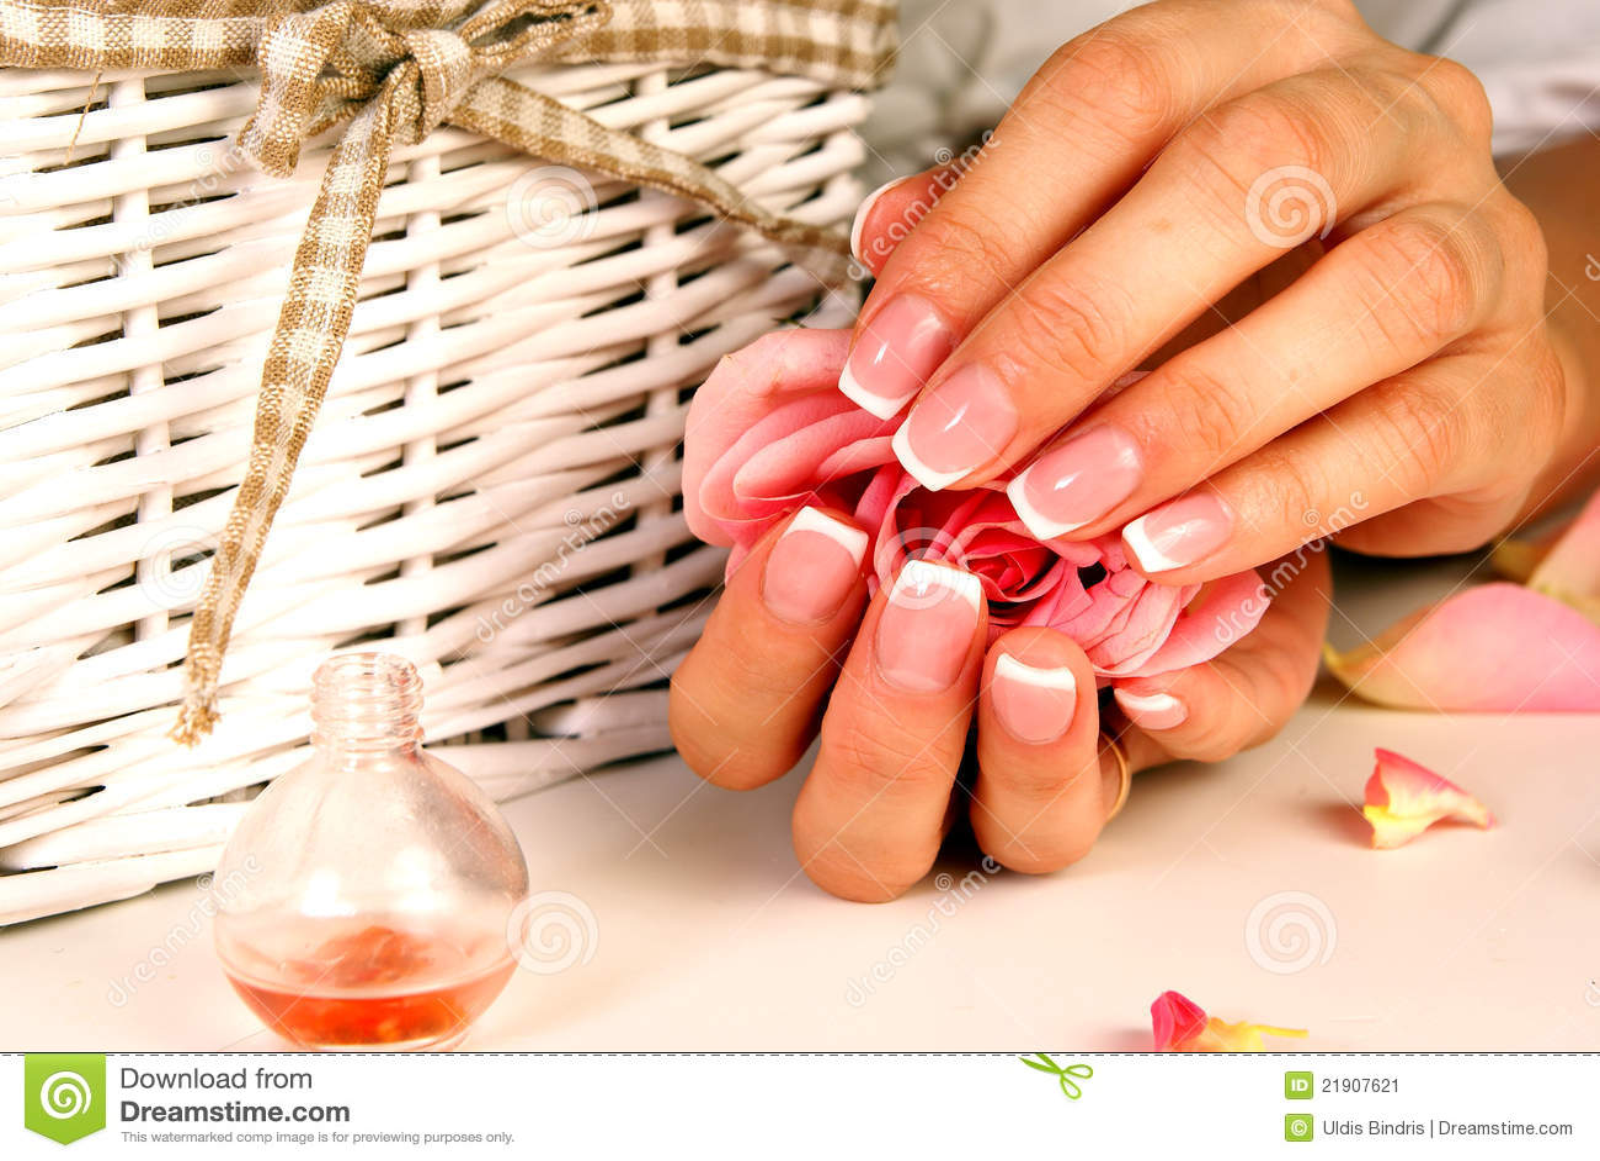 Nail Art Stock Image Image Of Adornment Application 21907621